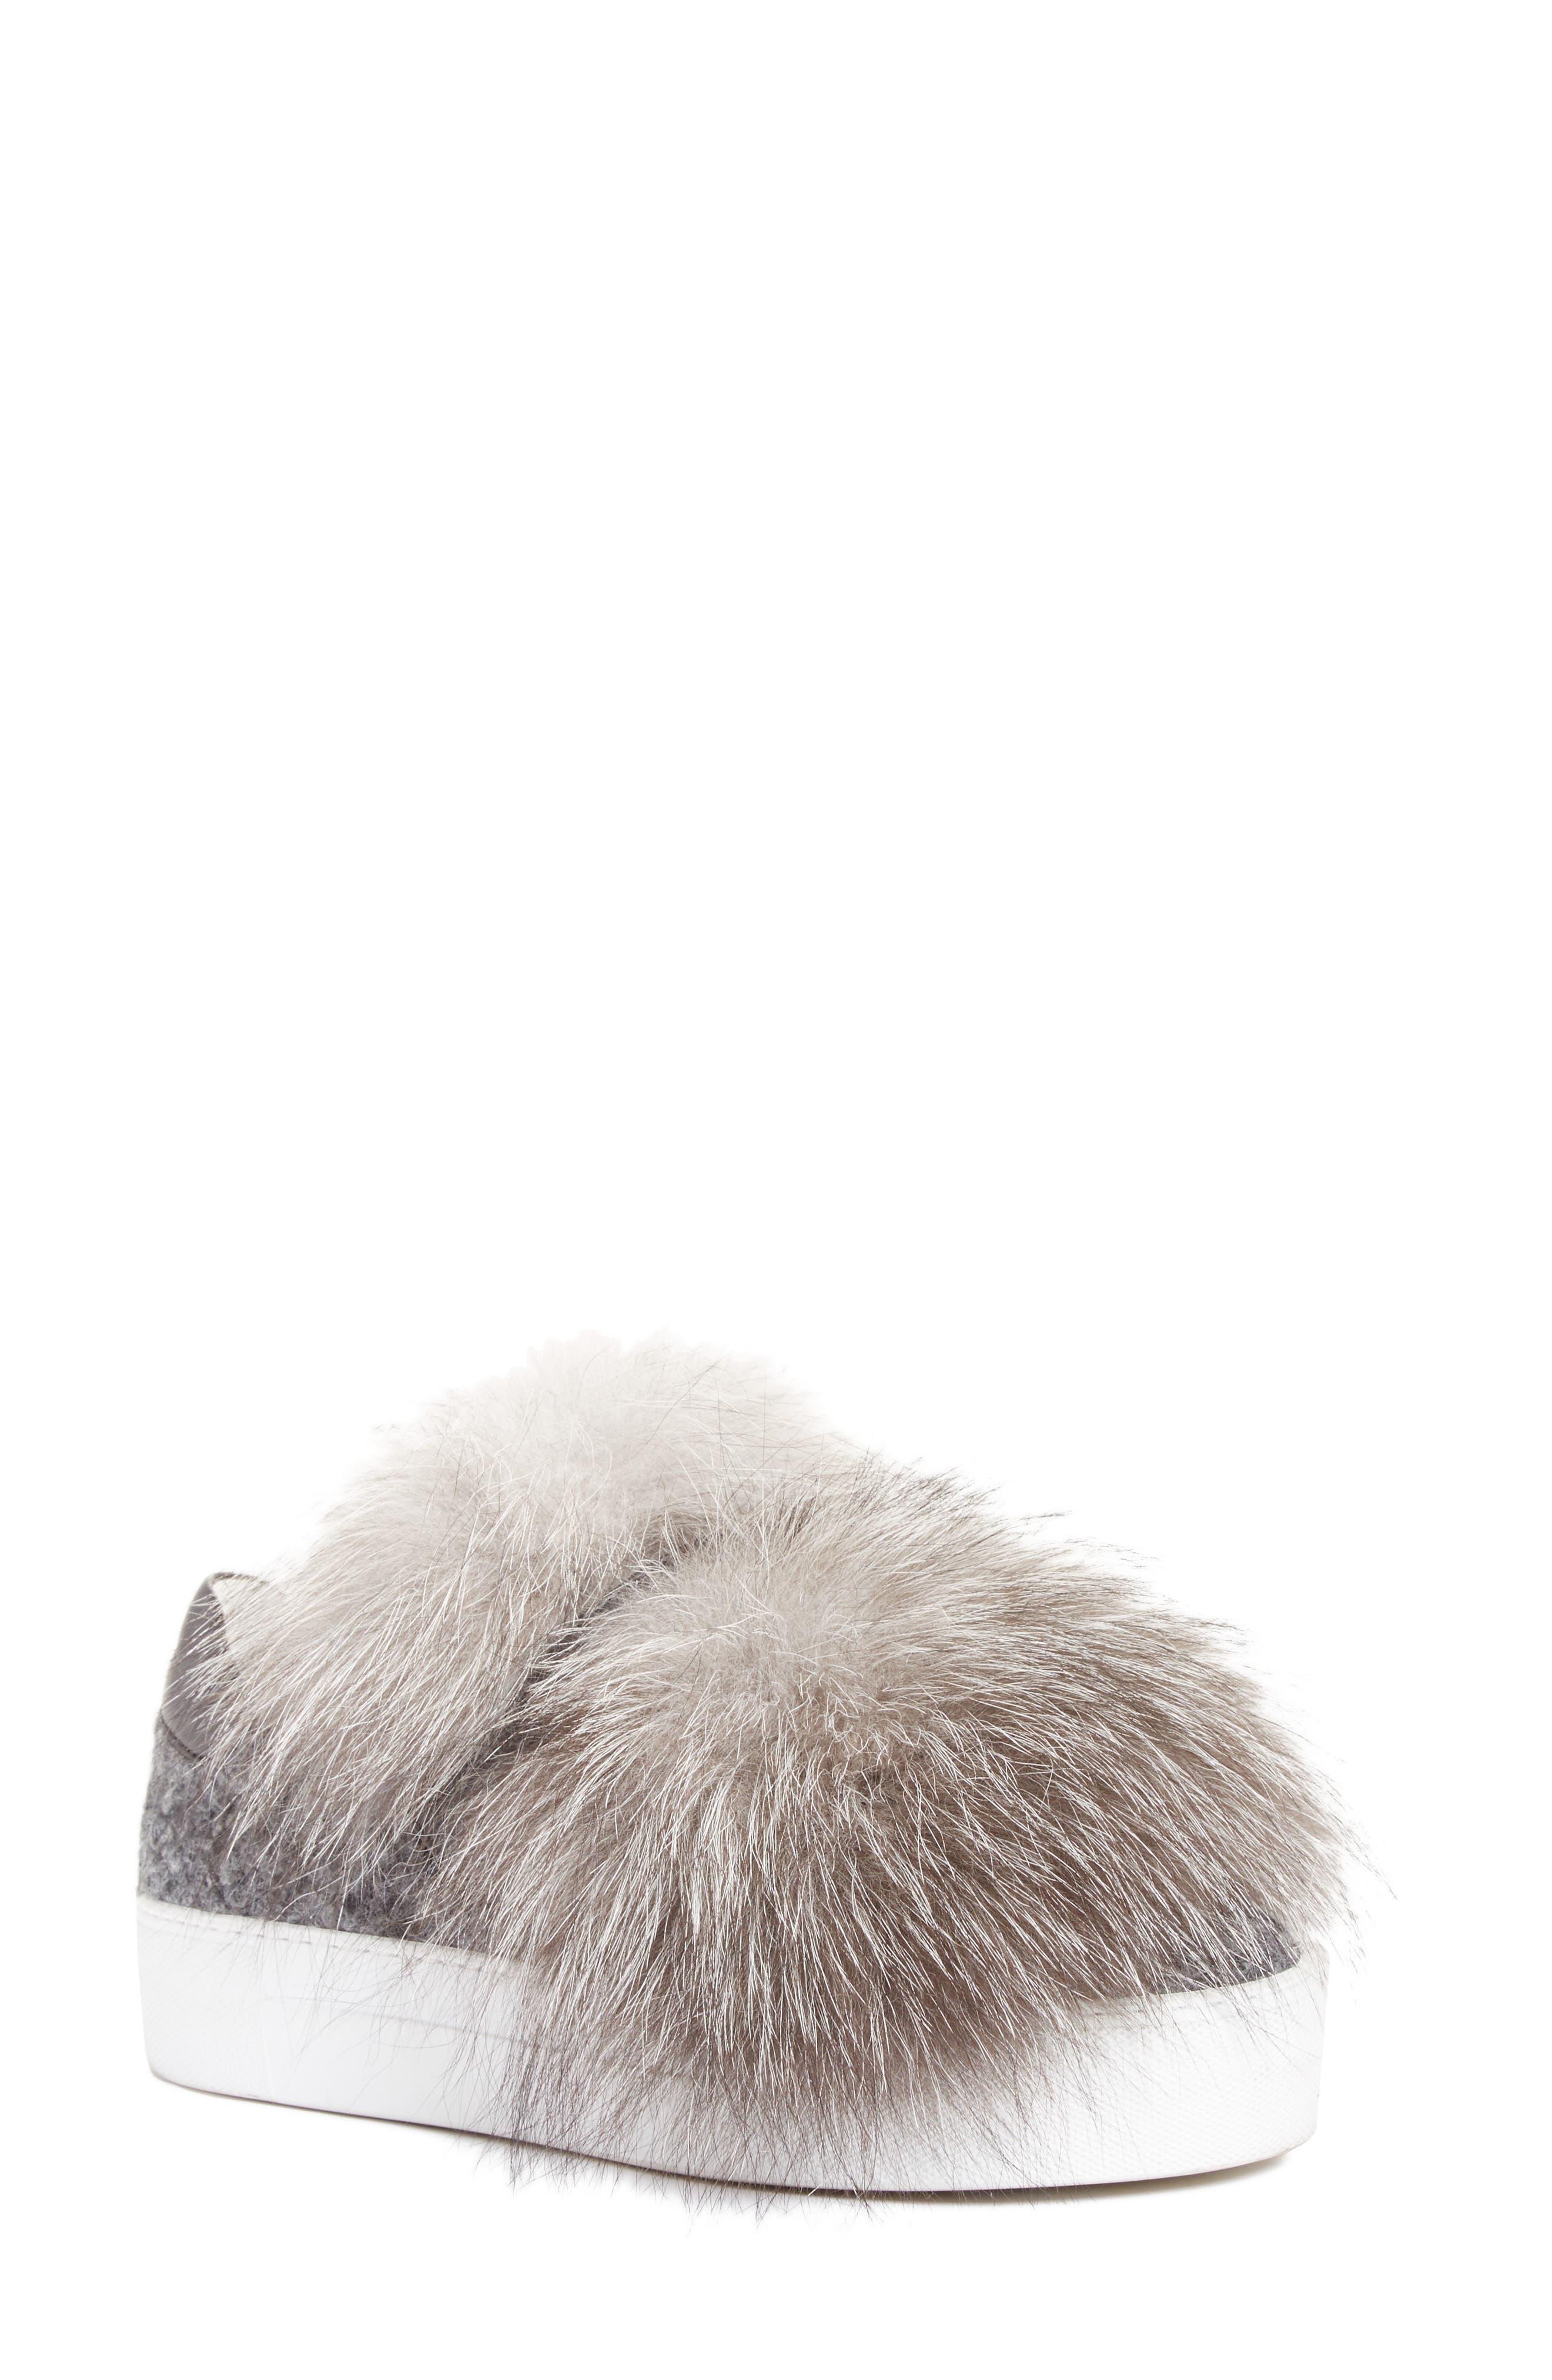 Victoire Genuine Fox Fur Slip-On Sneaker,                         Main,                         color, 020